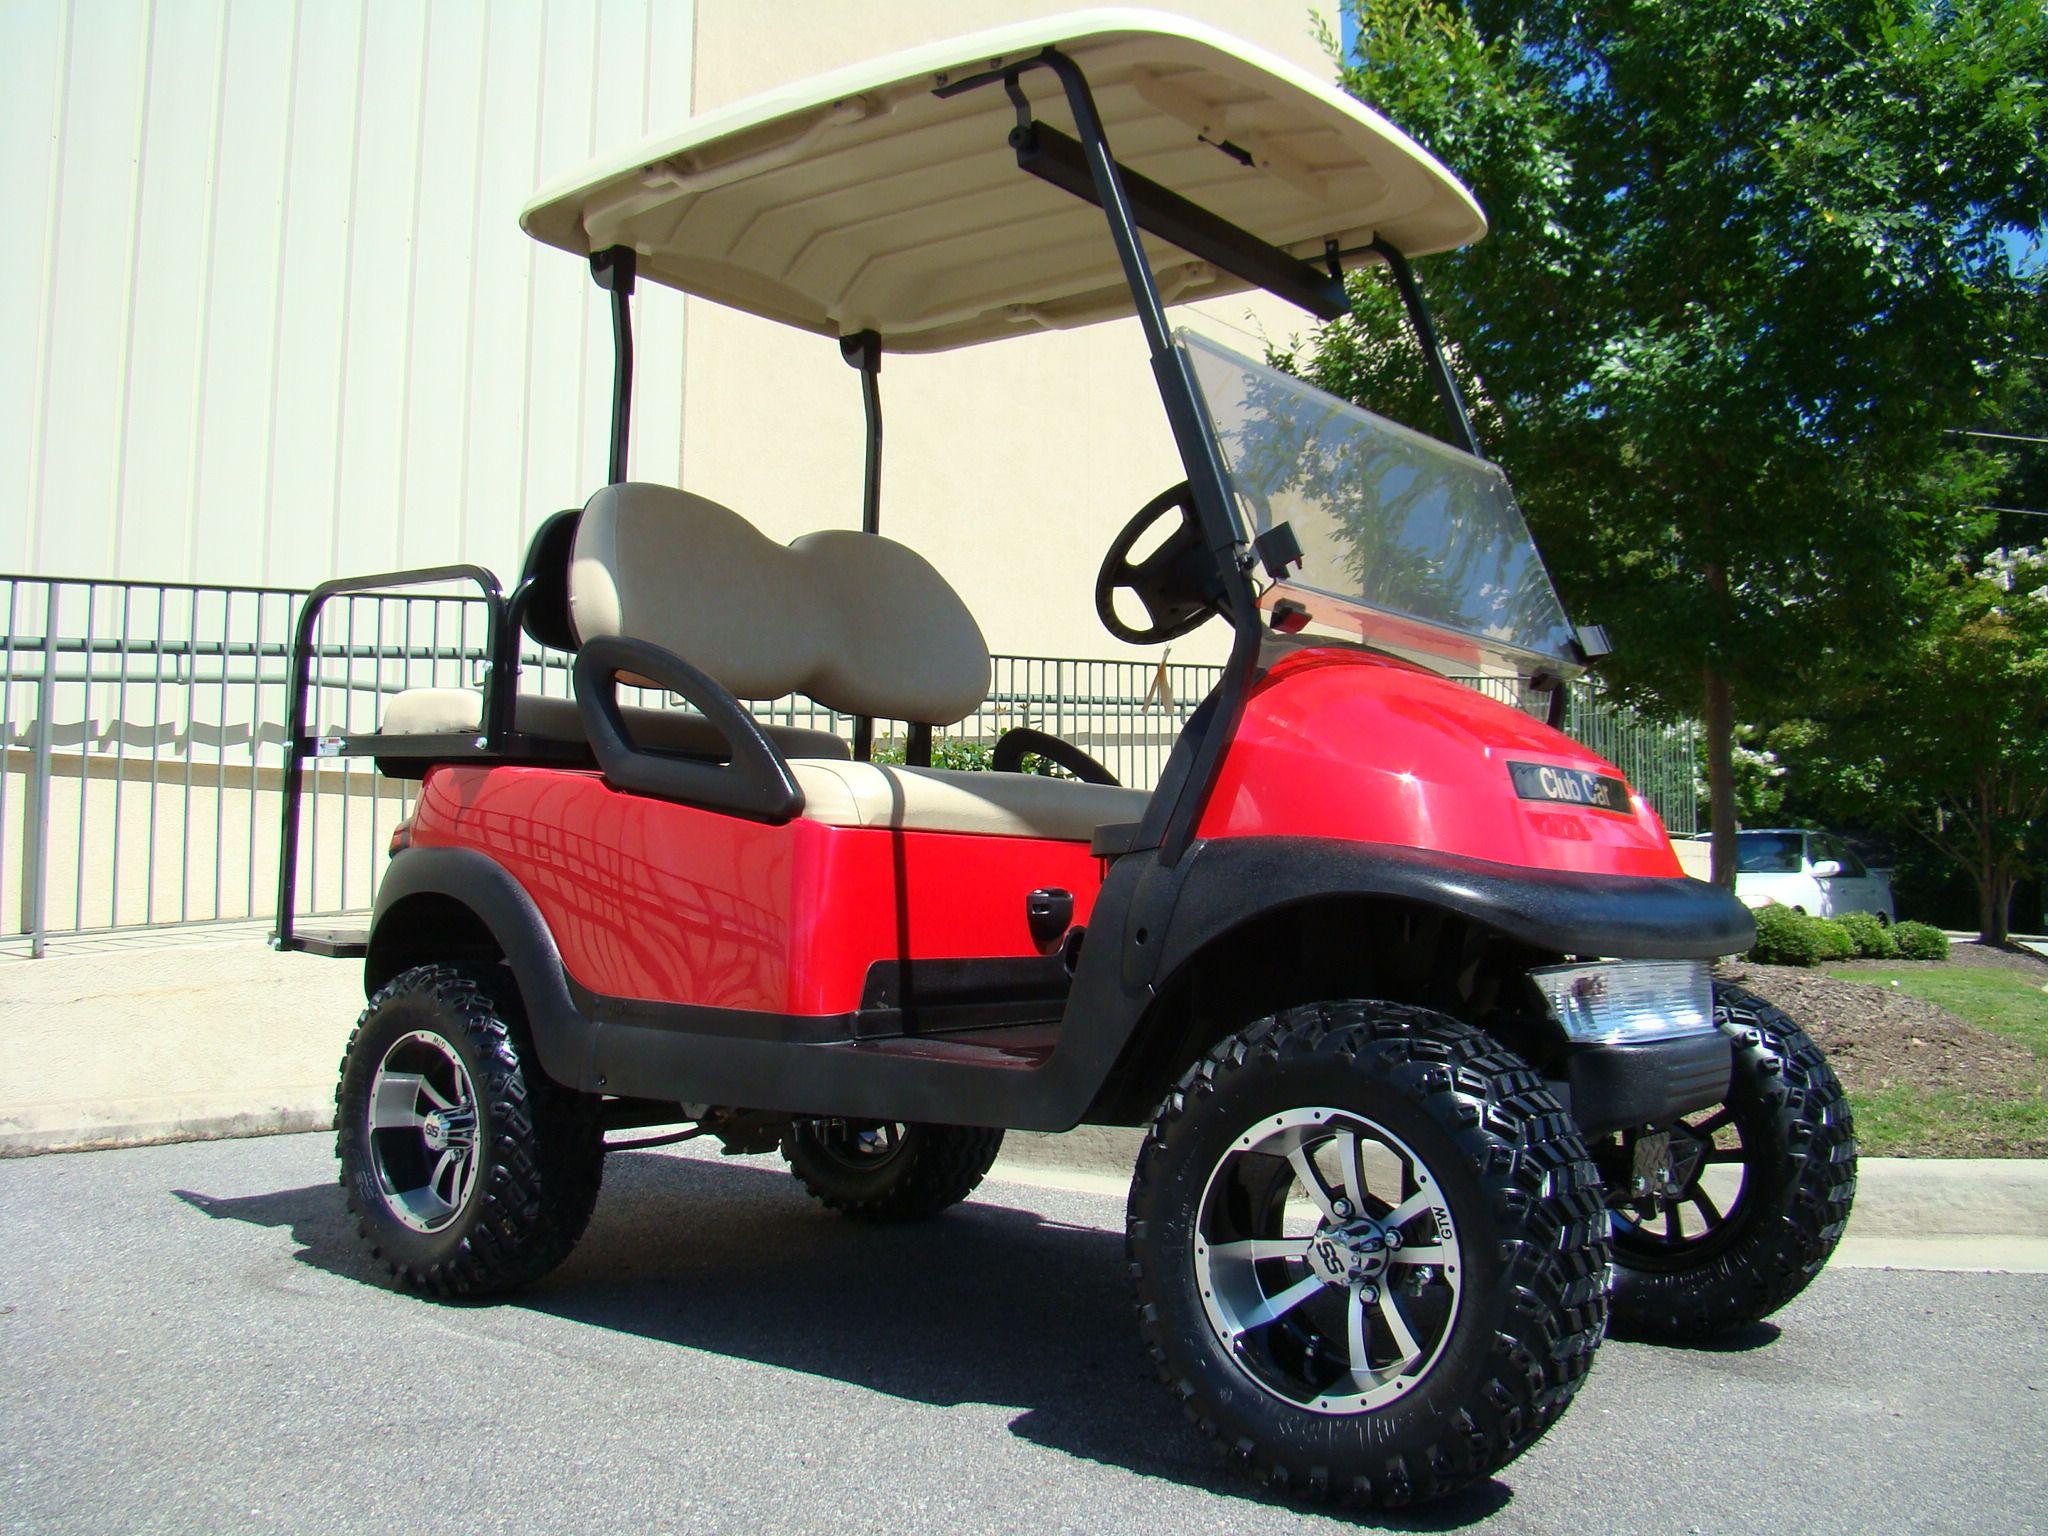 Custom Off-Road Golf Carts | Club Car & MoHo Vroom Vroom ...